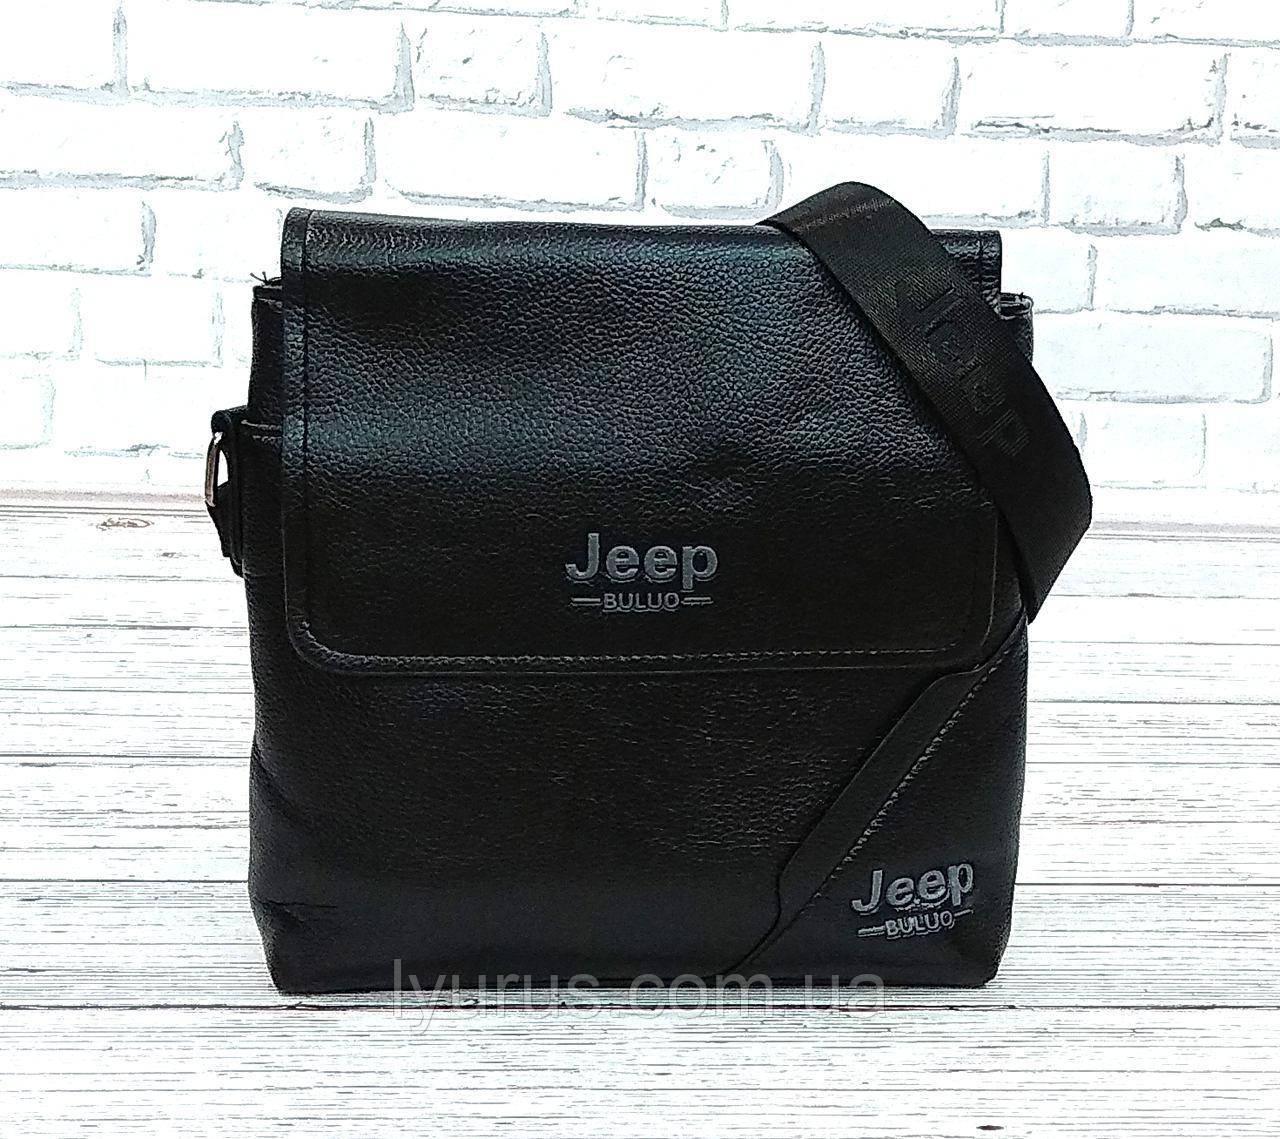 Мужская сумка через плечо Jeep. Черная. 25x23х5 Кожа PU / 556-2 black